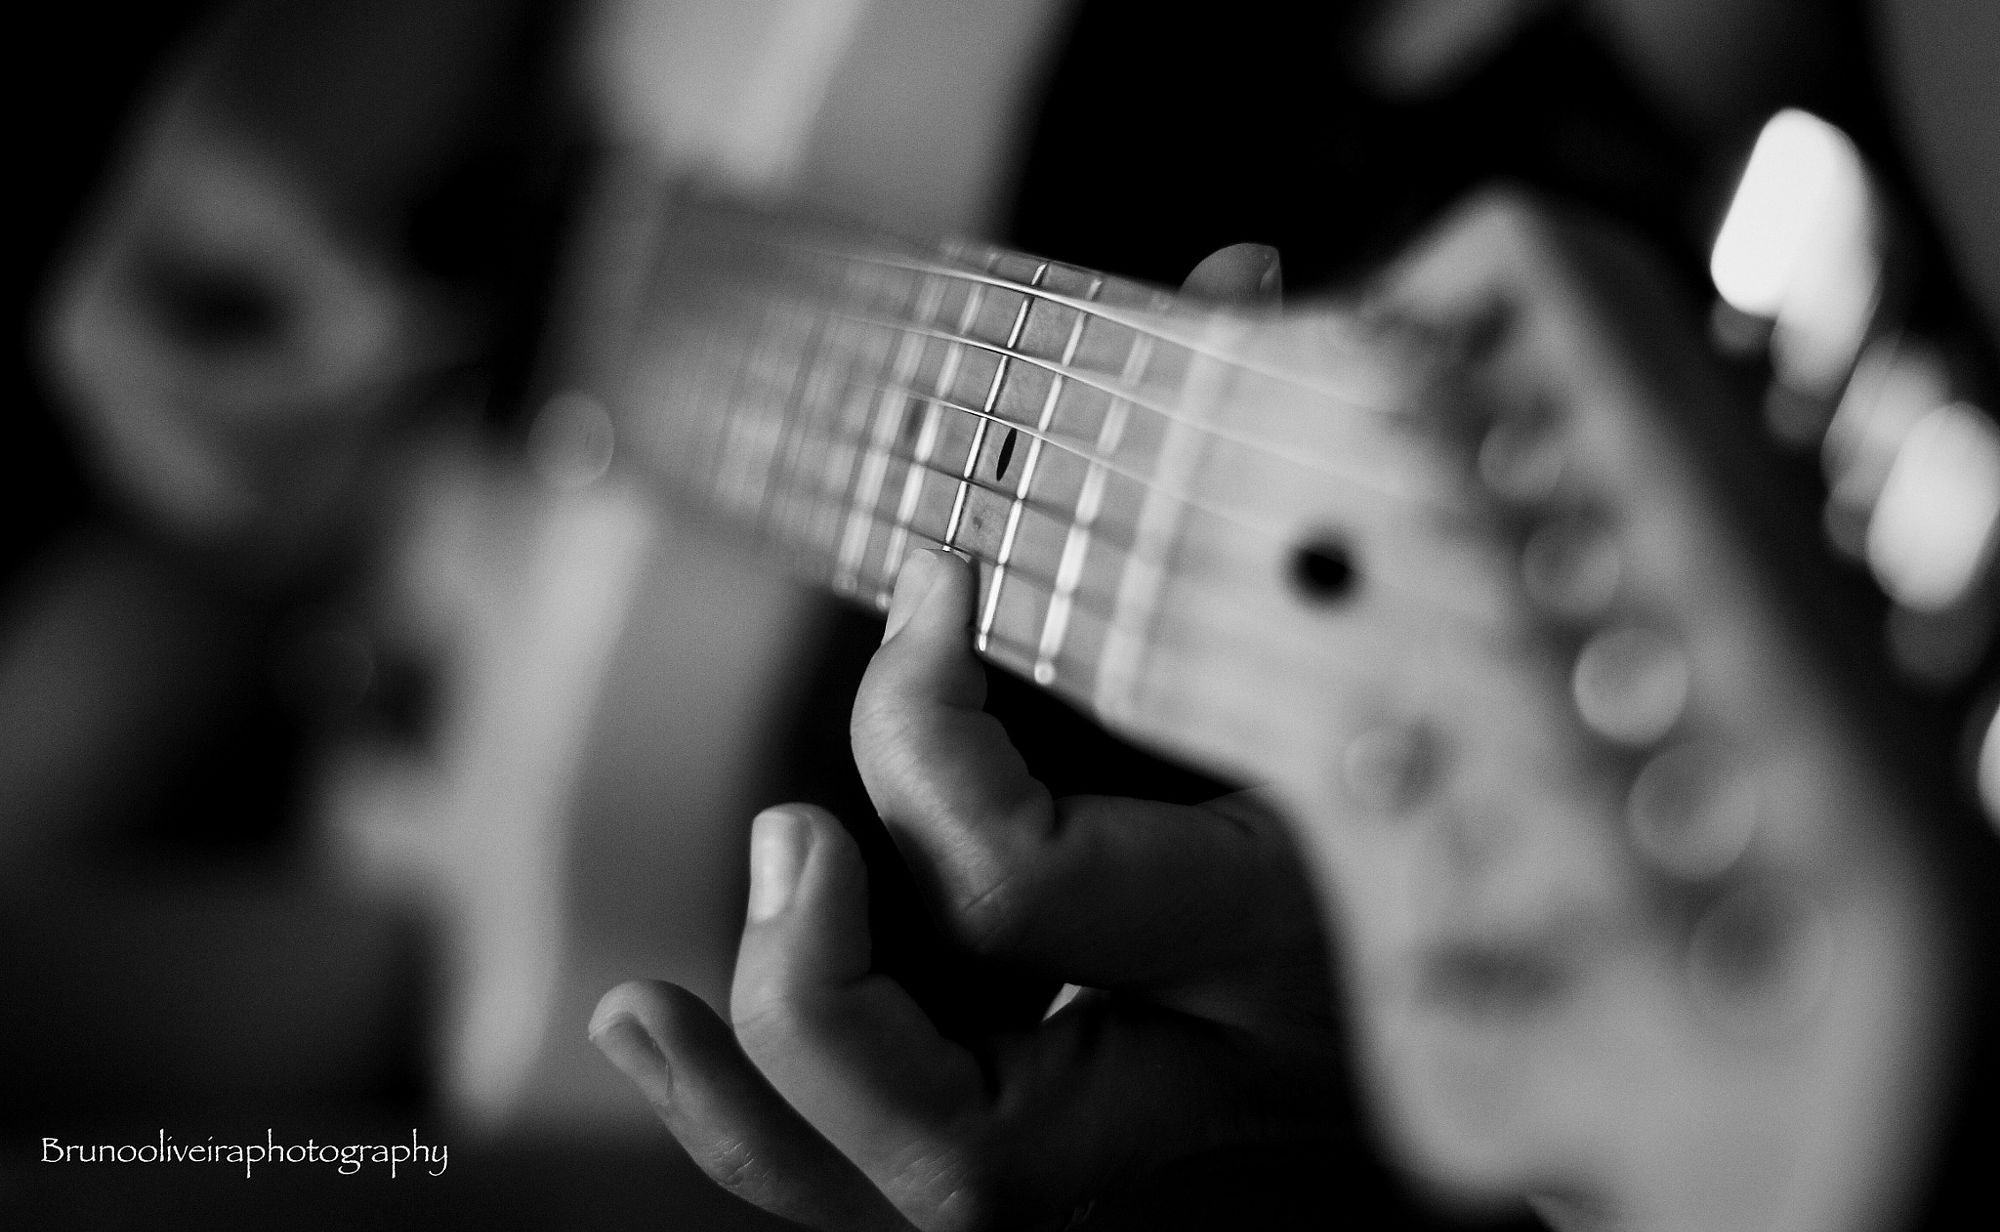 Playing a guitar by Bruno Oliveira (@brunooliveiraphotography) - Photo 183426643 / 500px.  #500px #blackandwhite #schwarzweiss #noiretblanc #siyahbeyaz #monochrome #studio #concert #music #guitar #instrument #band #musician #sound #bass #jazz #lenses #praia #acoustic #música #pessoas #férias #sensor #brasil #joãopessoa #augsburg #ulm #münchen #stuttgart #frankfurt